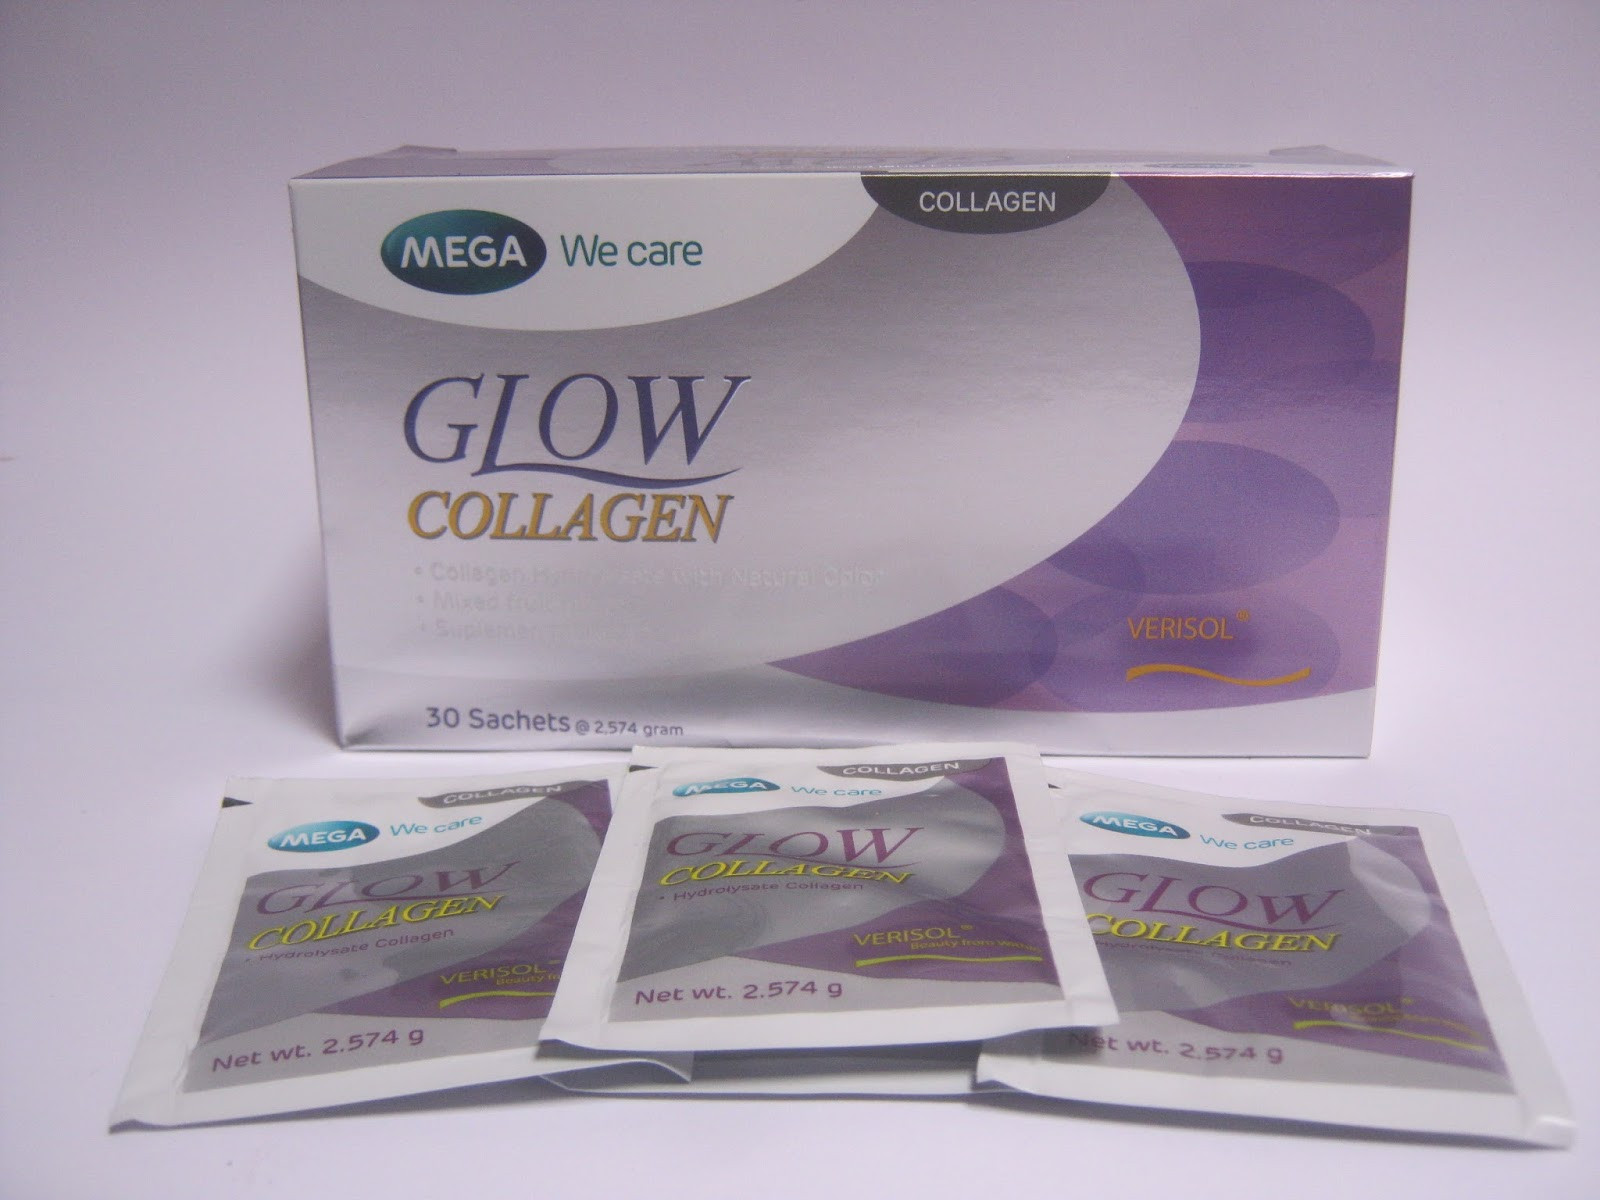 Glow Collagen, Mengurangi Kerutan Hingga Melembabkan Kulit